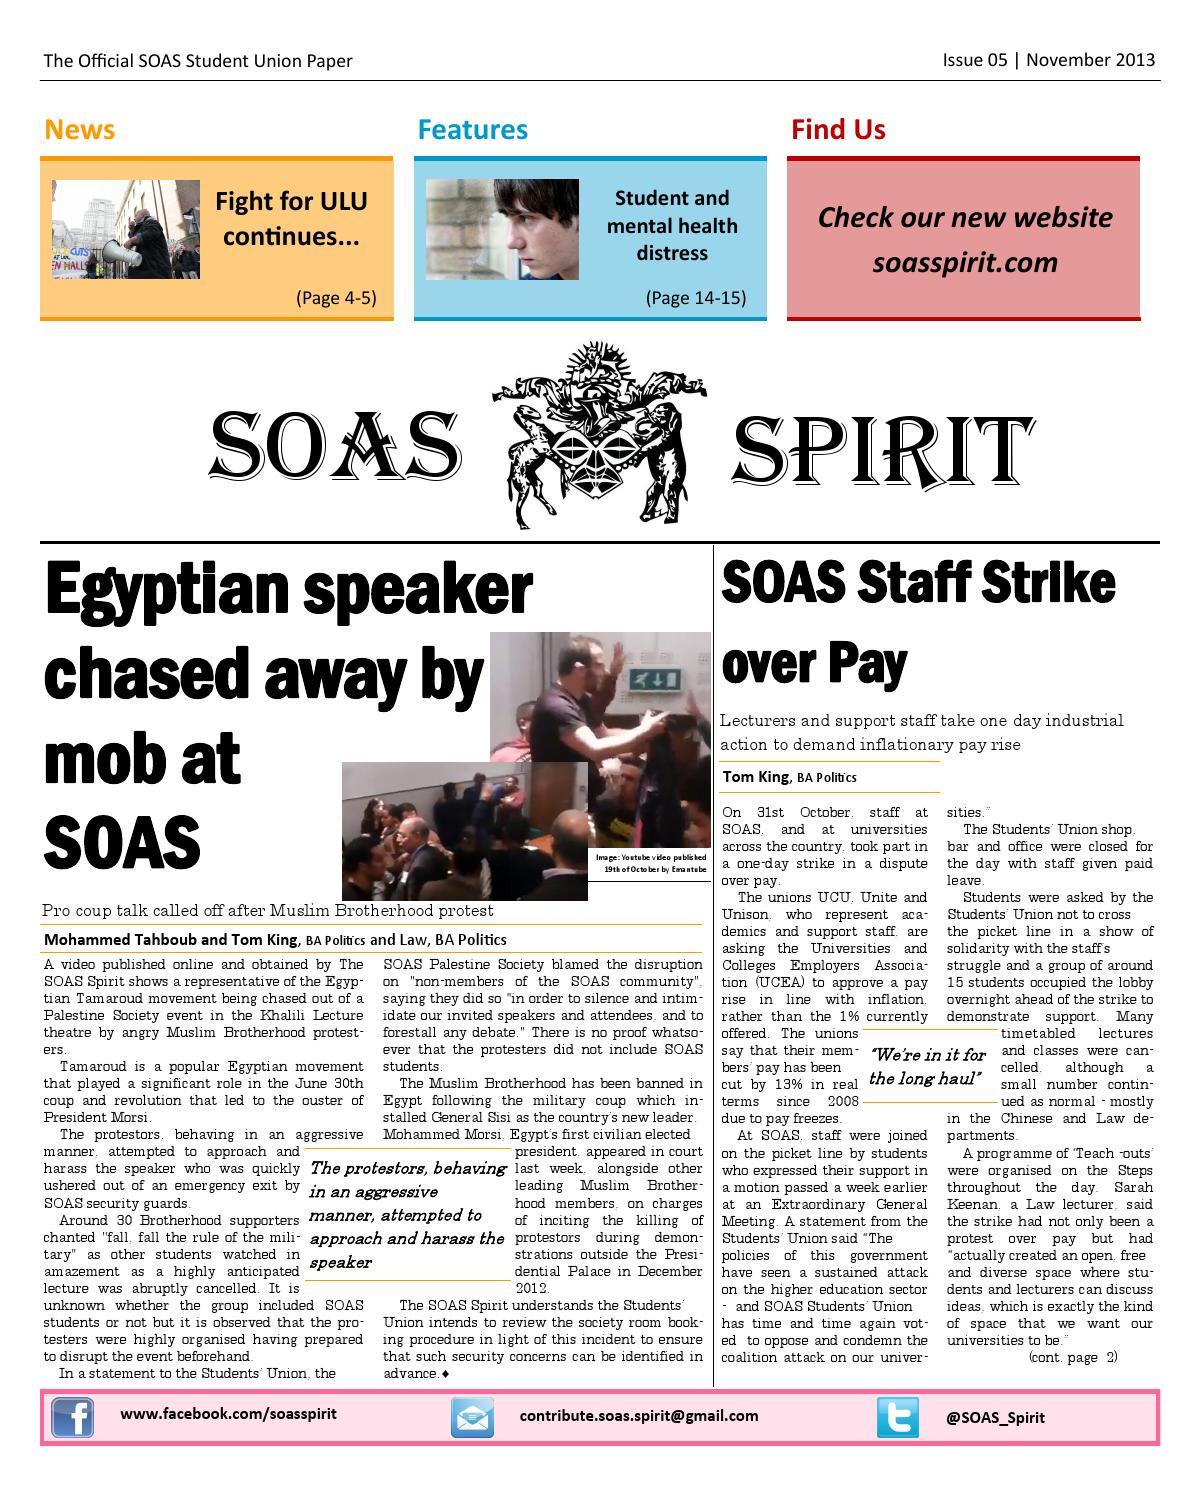 The SOAS spirit issue 5 by The SOAS Spirit - issuu